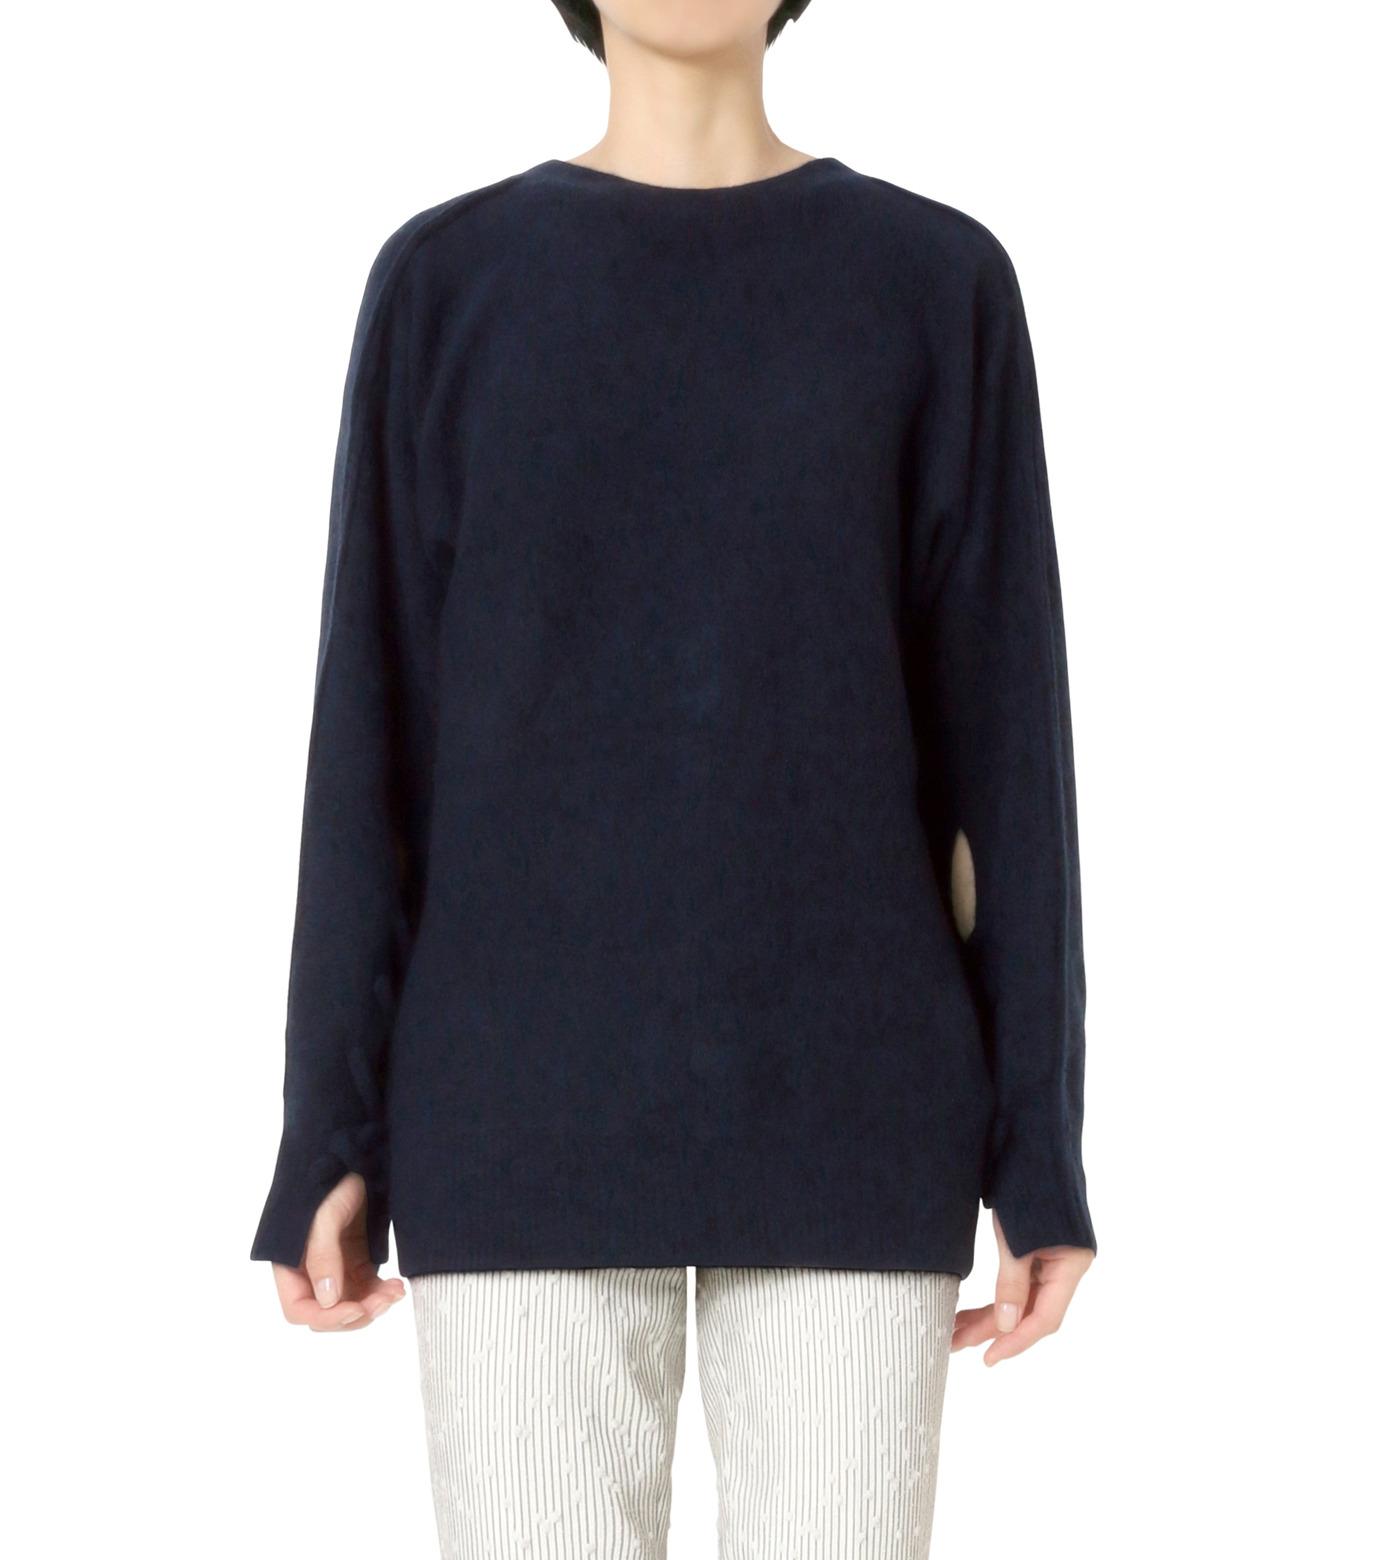 3.1 Phillip Lim(スリーワン フィリップリム)のLS Sweater w/Back V&Knots-NAVY(ニット/knit)-P161-7631PCY-93 拡大詳細画像1